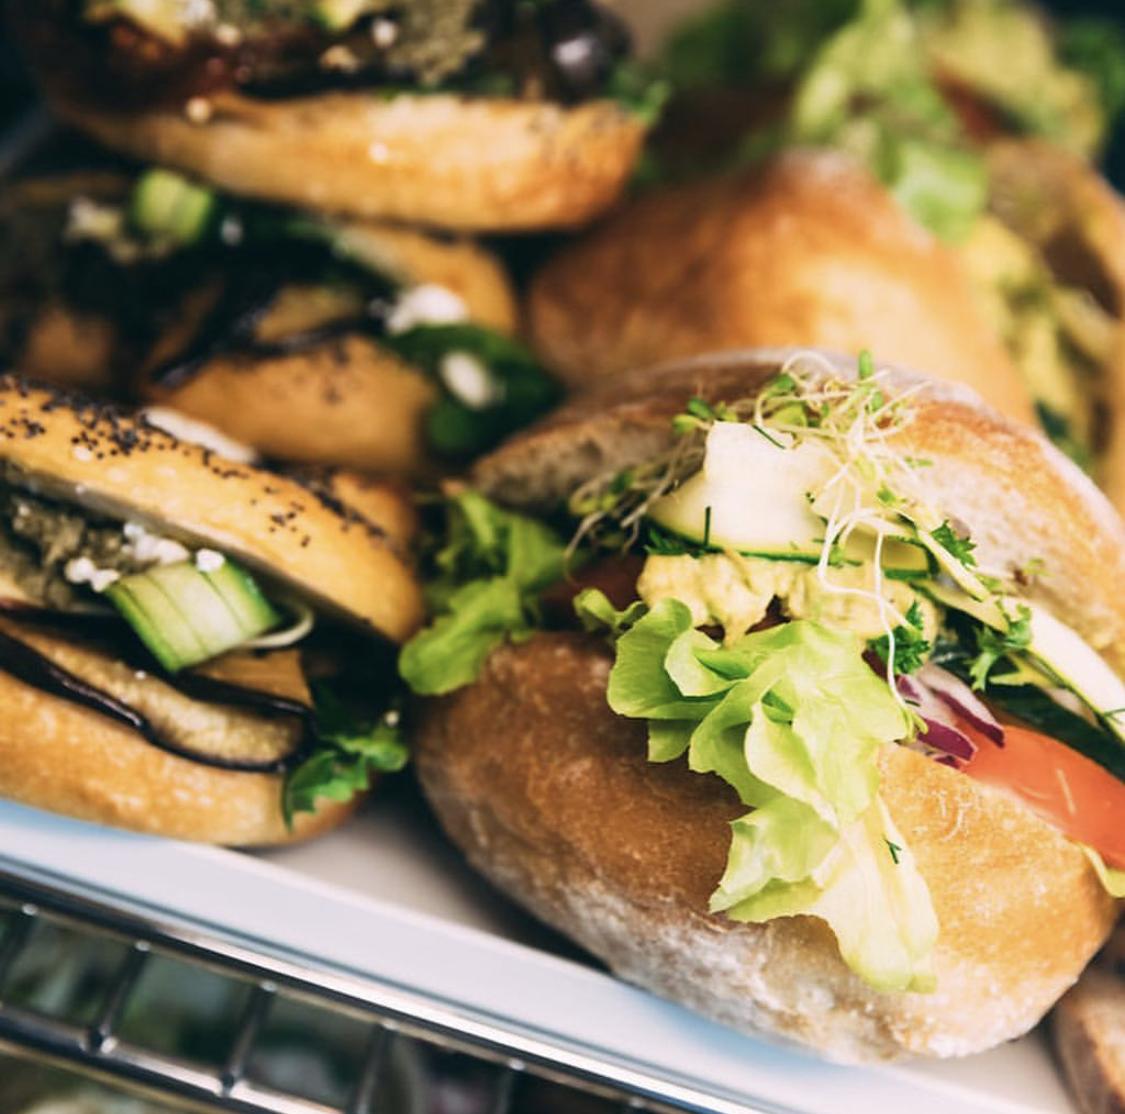 Good Karma breakfast sandwiches